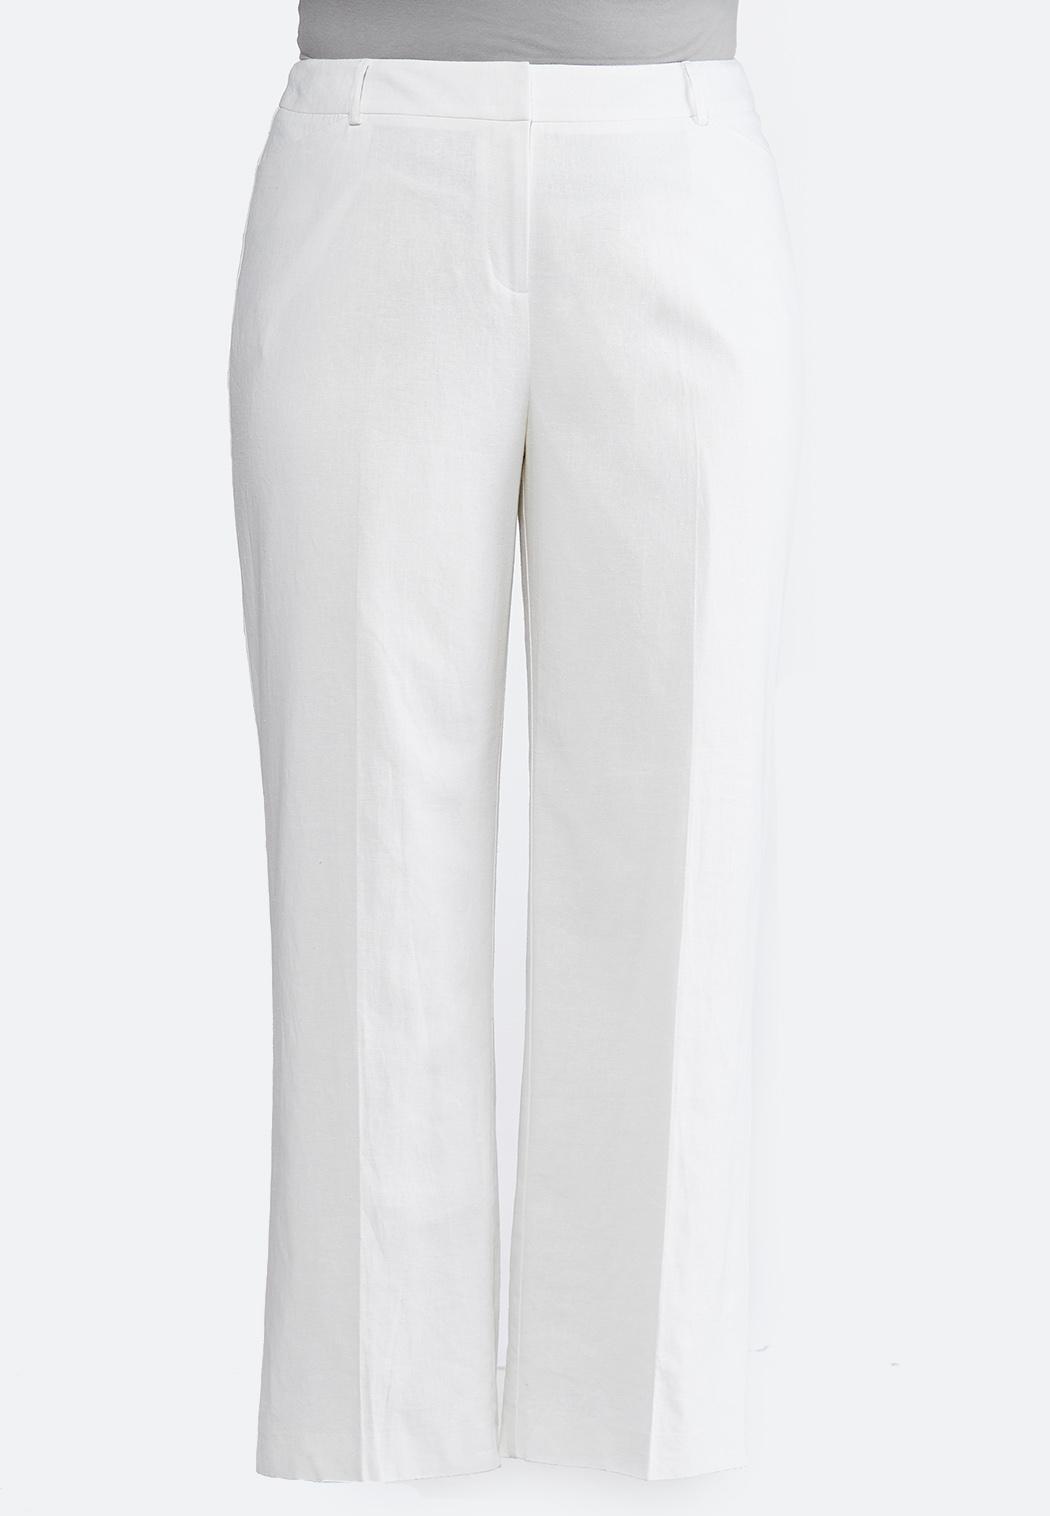 aa27a3d13aa Plus Size White Linen Trouser Pants Wide Leg Cato Fashions